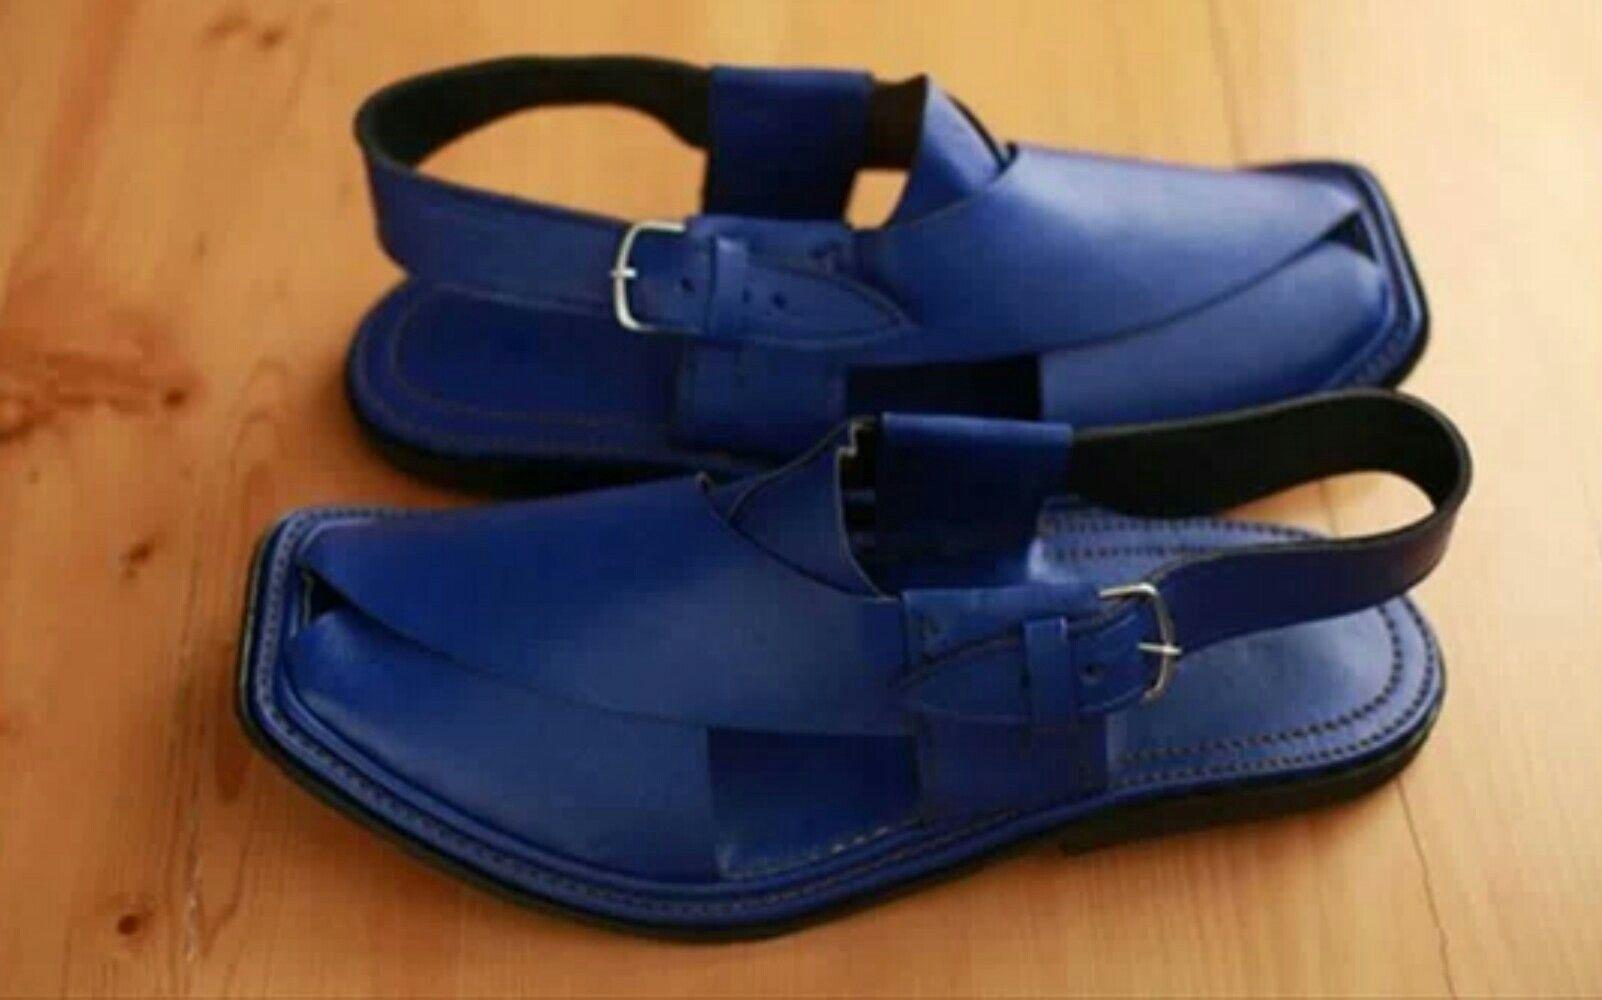 91127588e87 Borjan men sandals blue